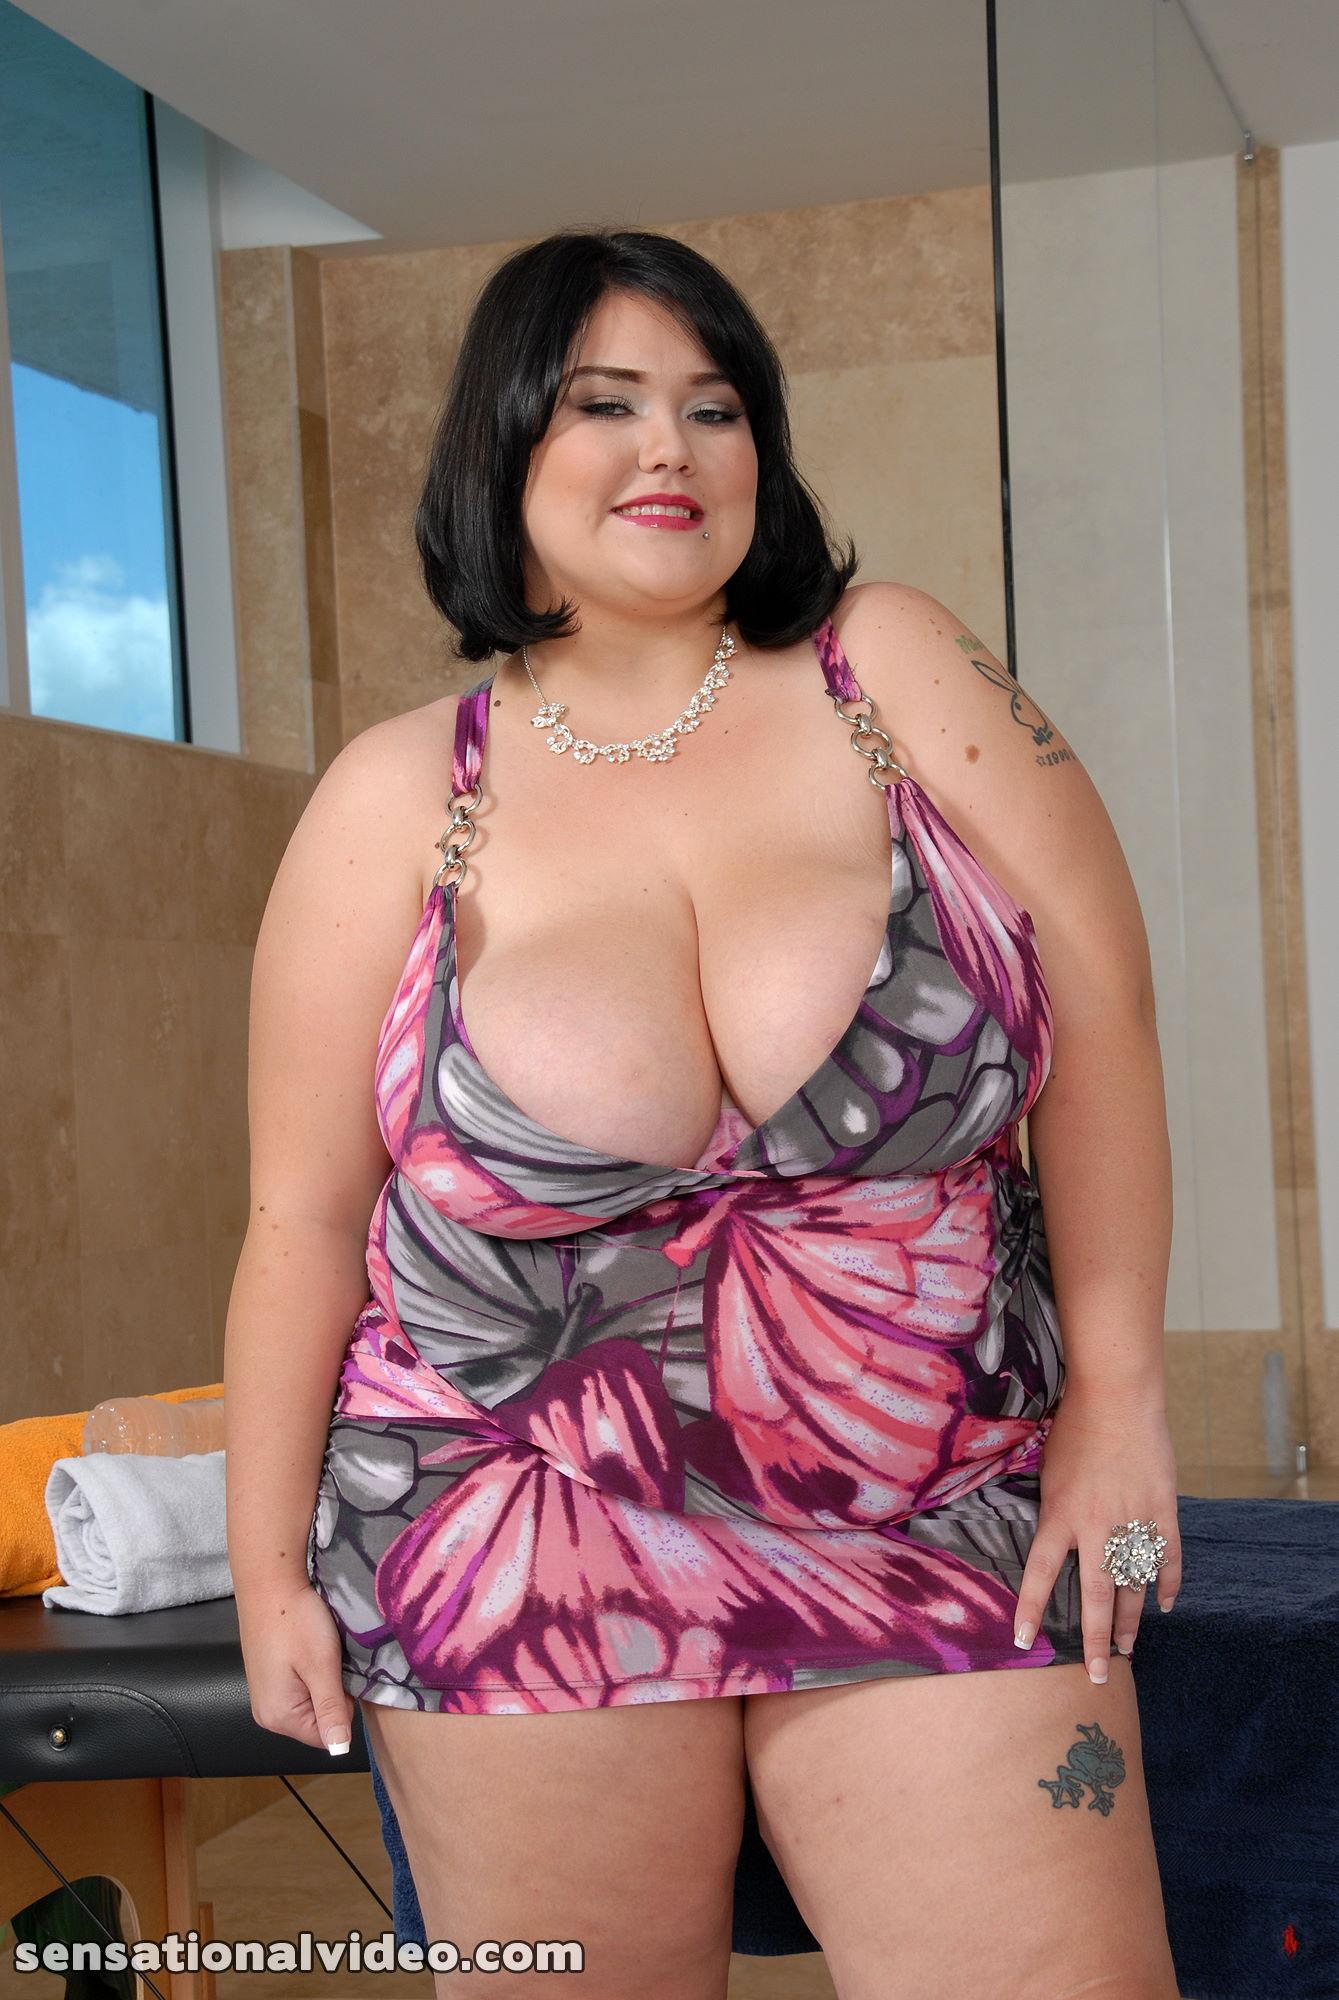 Big tits latina milf sienna west teacher